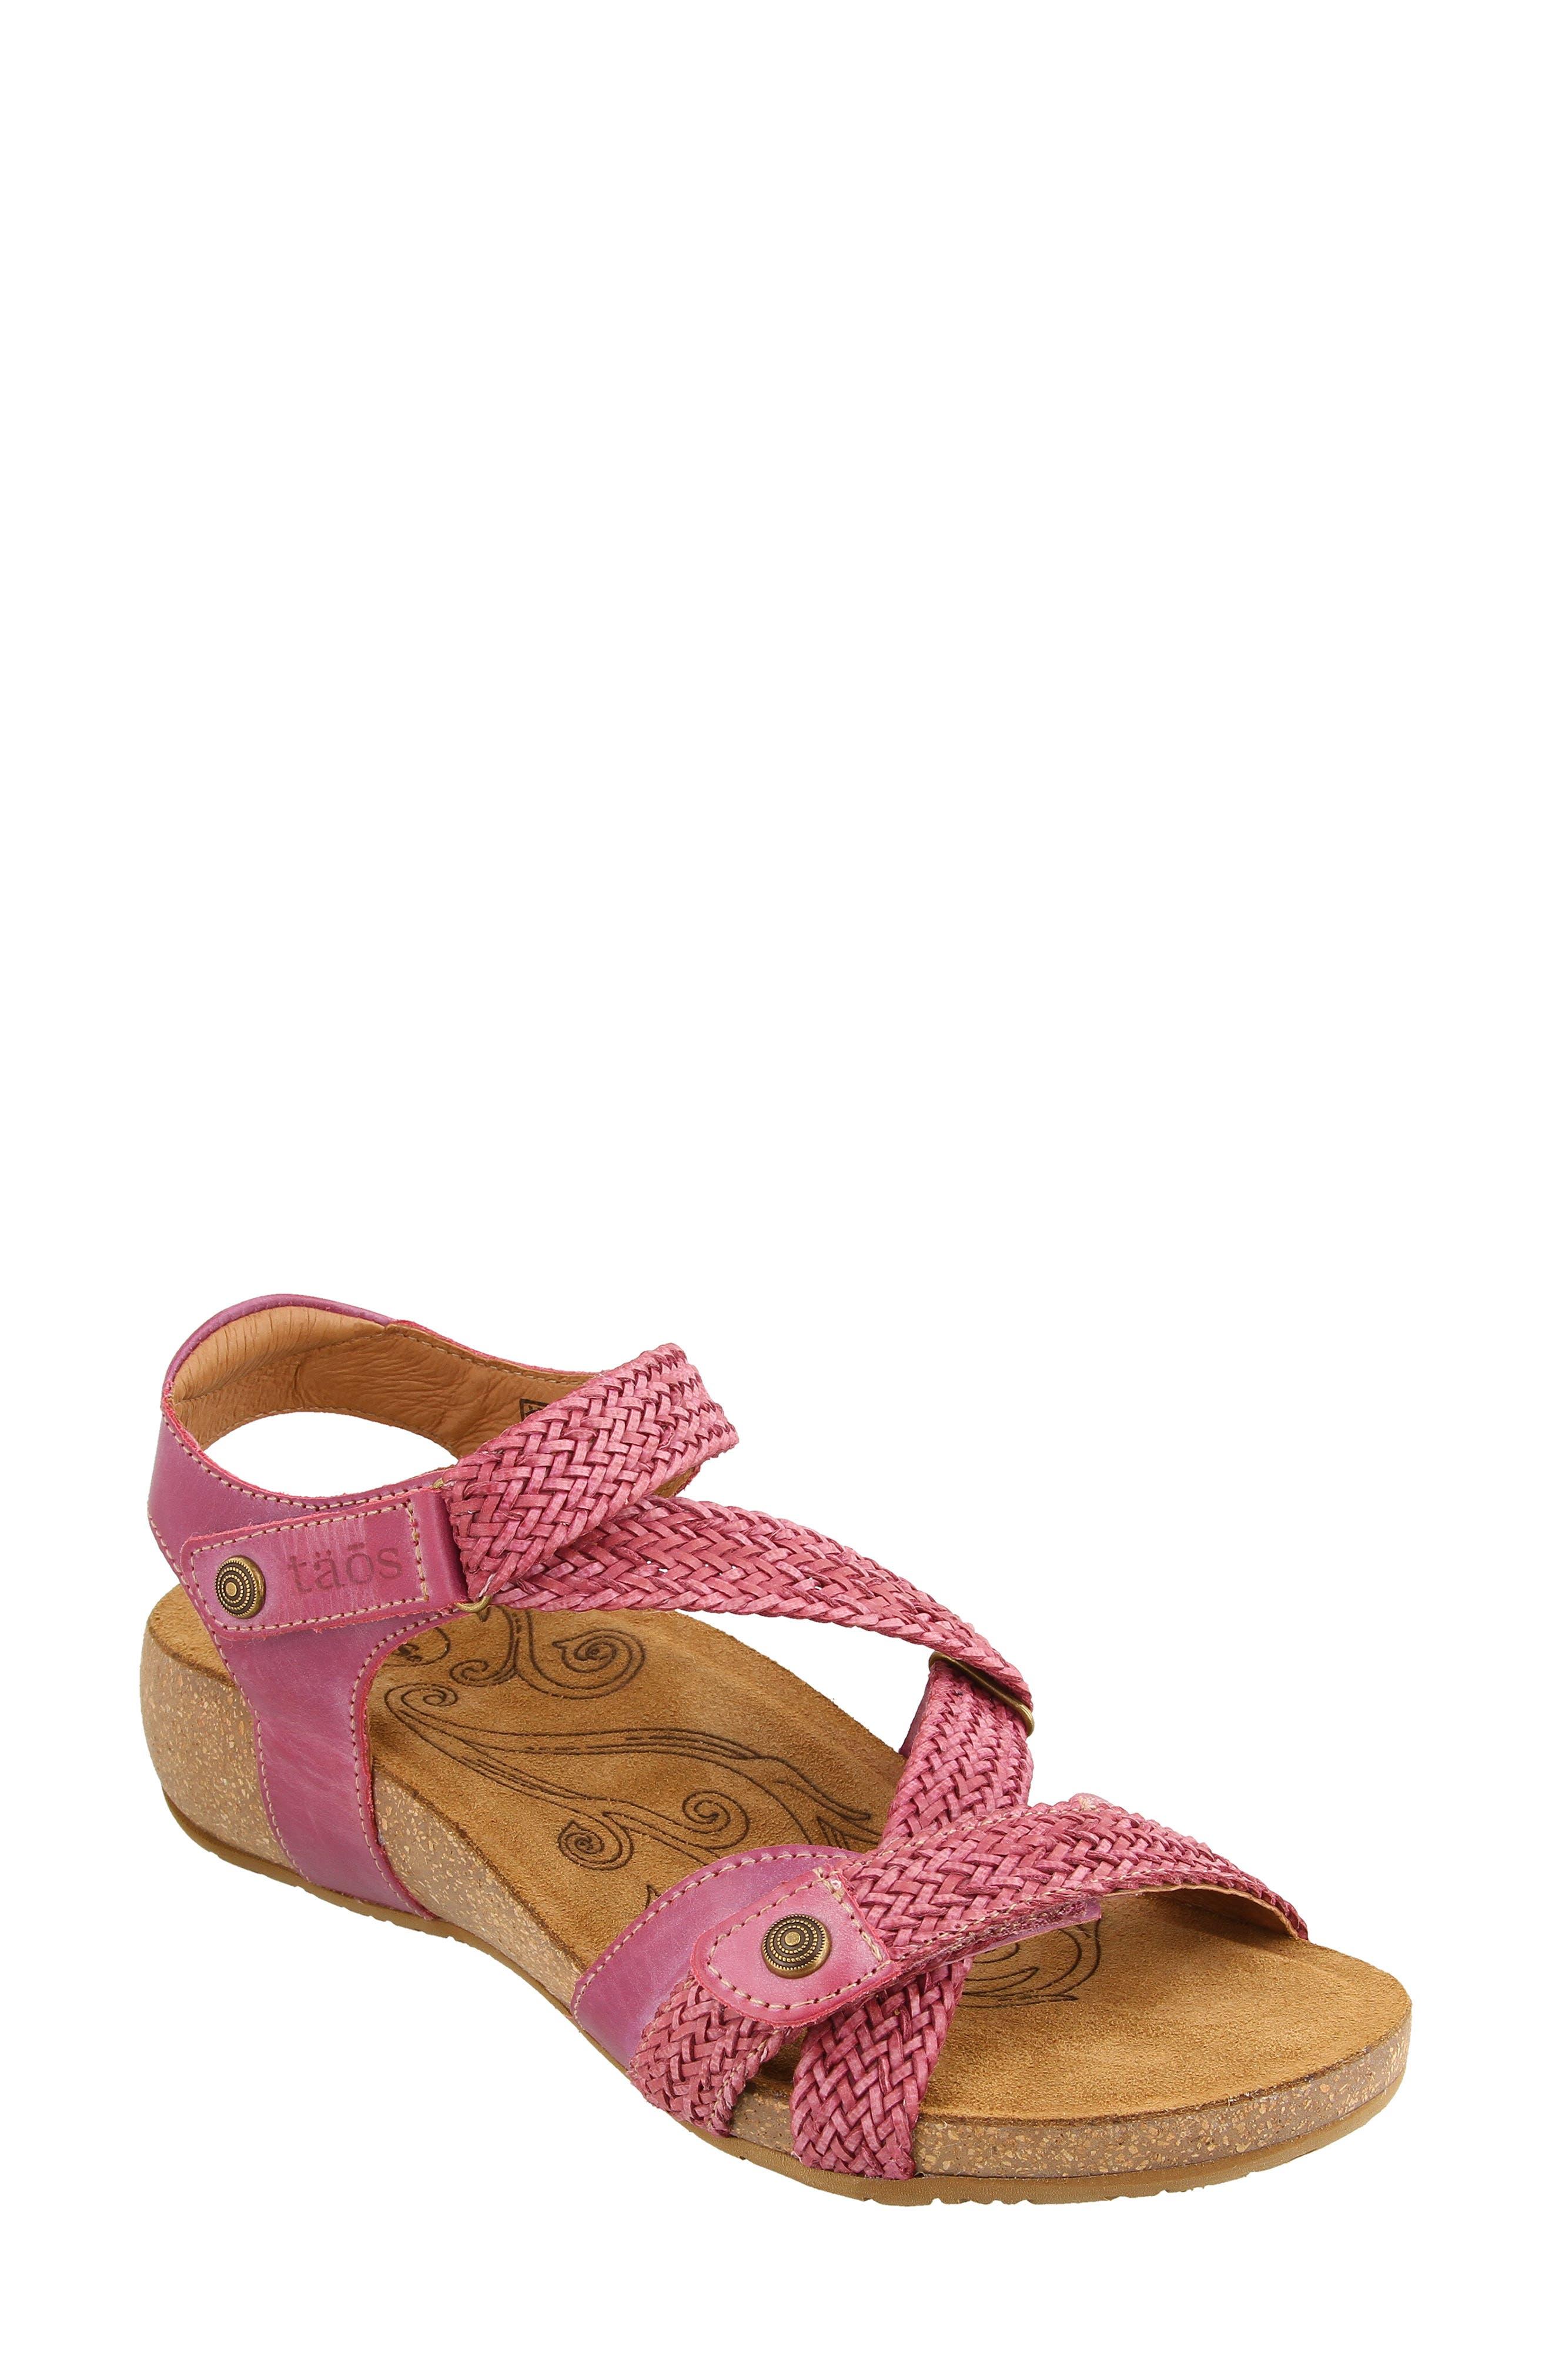 Women's Taos Shoes Sale \u0026 Clearance